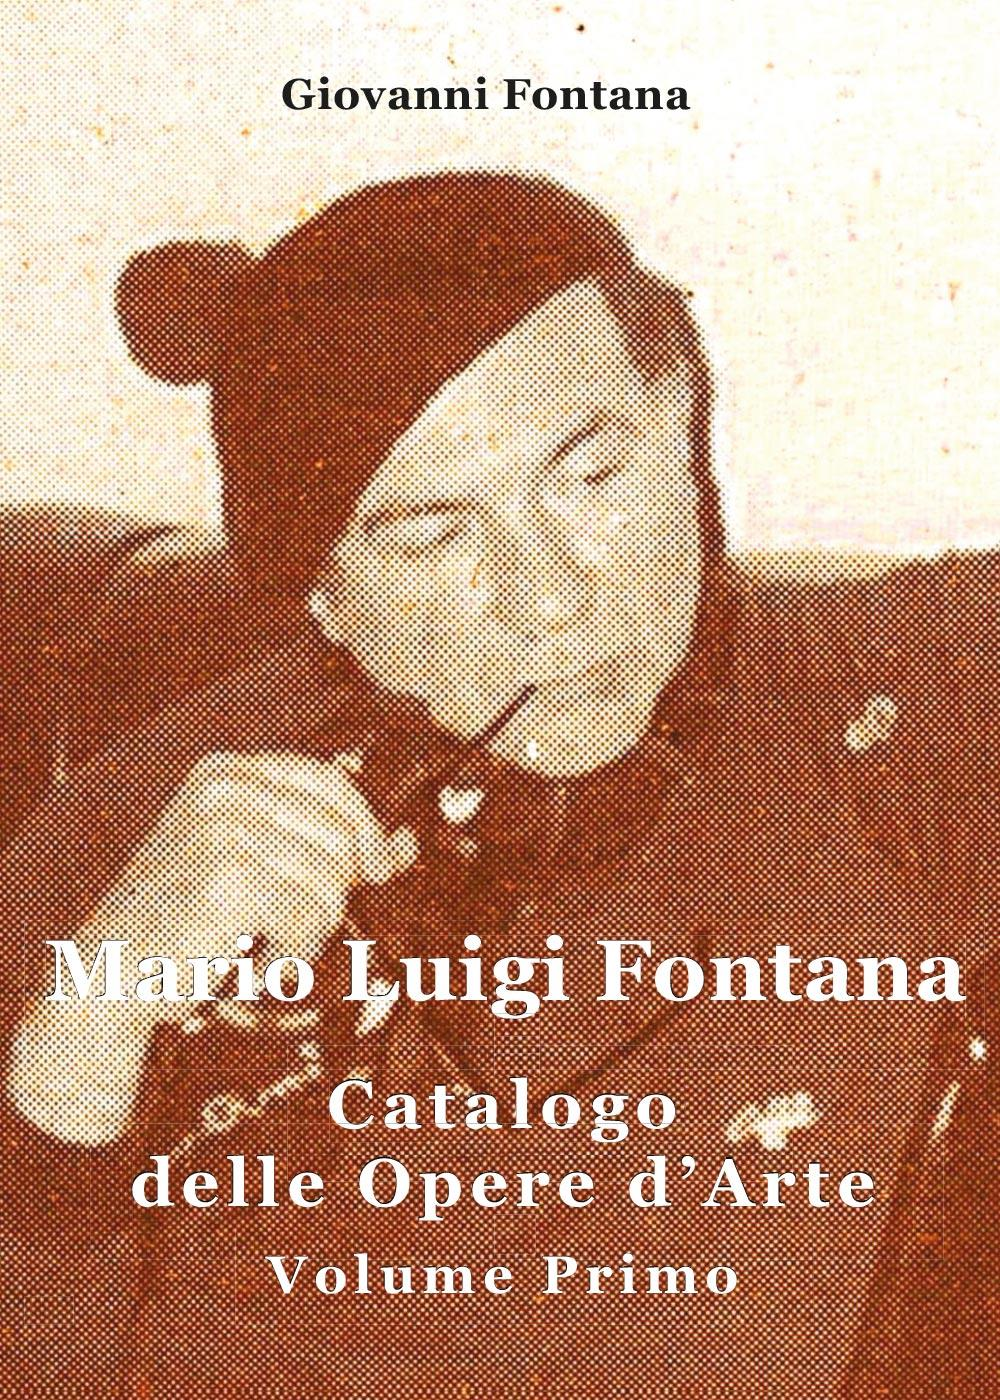 Mario Luigi Fontana. Catalogo delle opere d'arte. Volume Primo